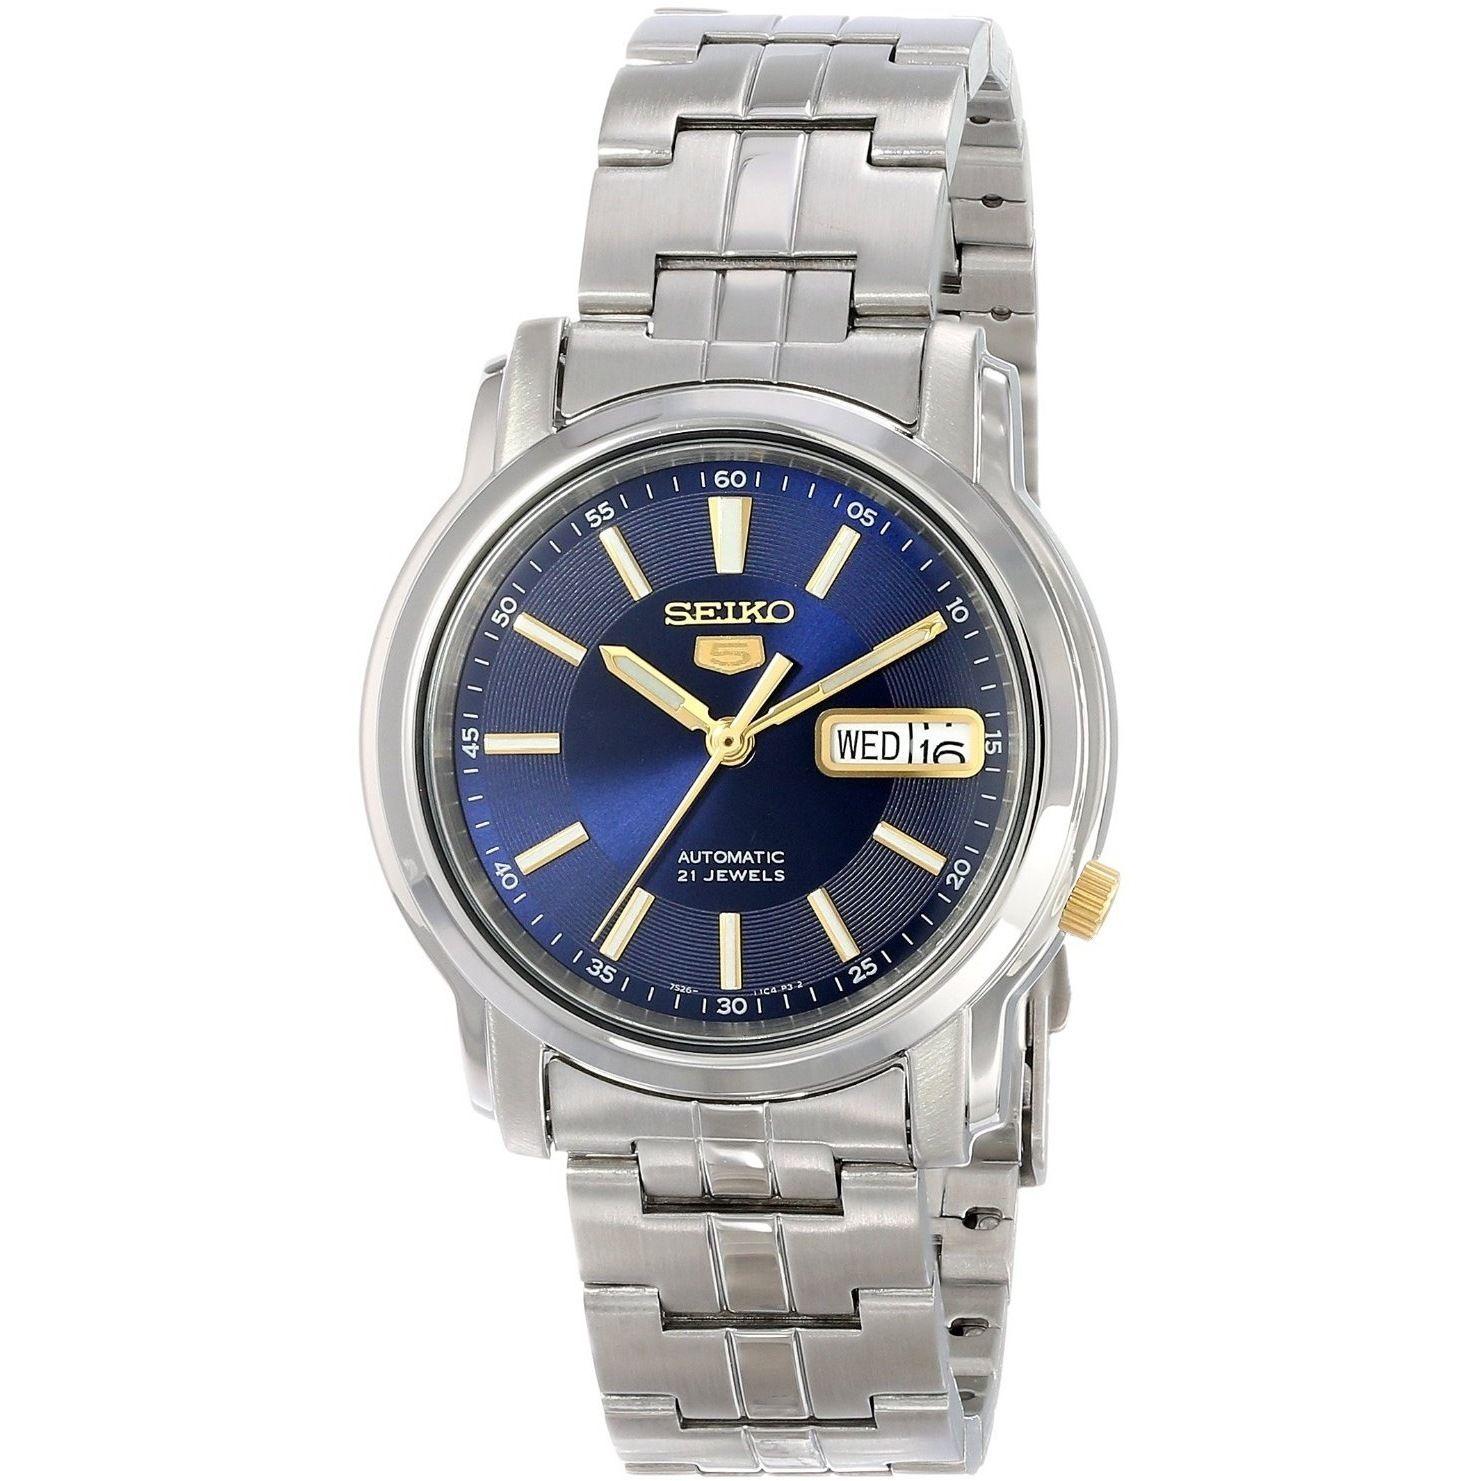 seiko men s 5 silvertone watch snkl79k1 by international bag seiko men s 5 silvertone watch snkl79k1 overstock shopping big discounts on seiko men s watches